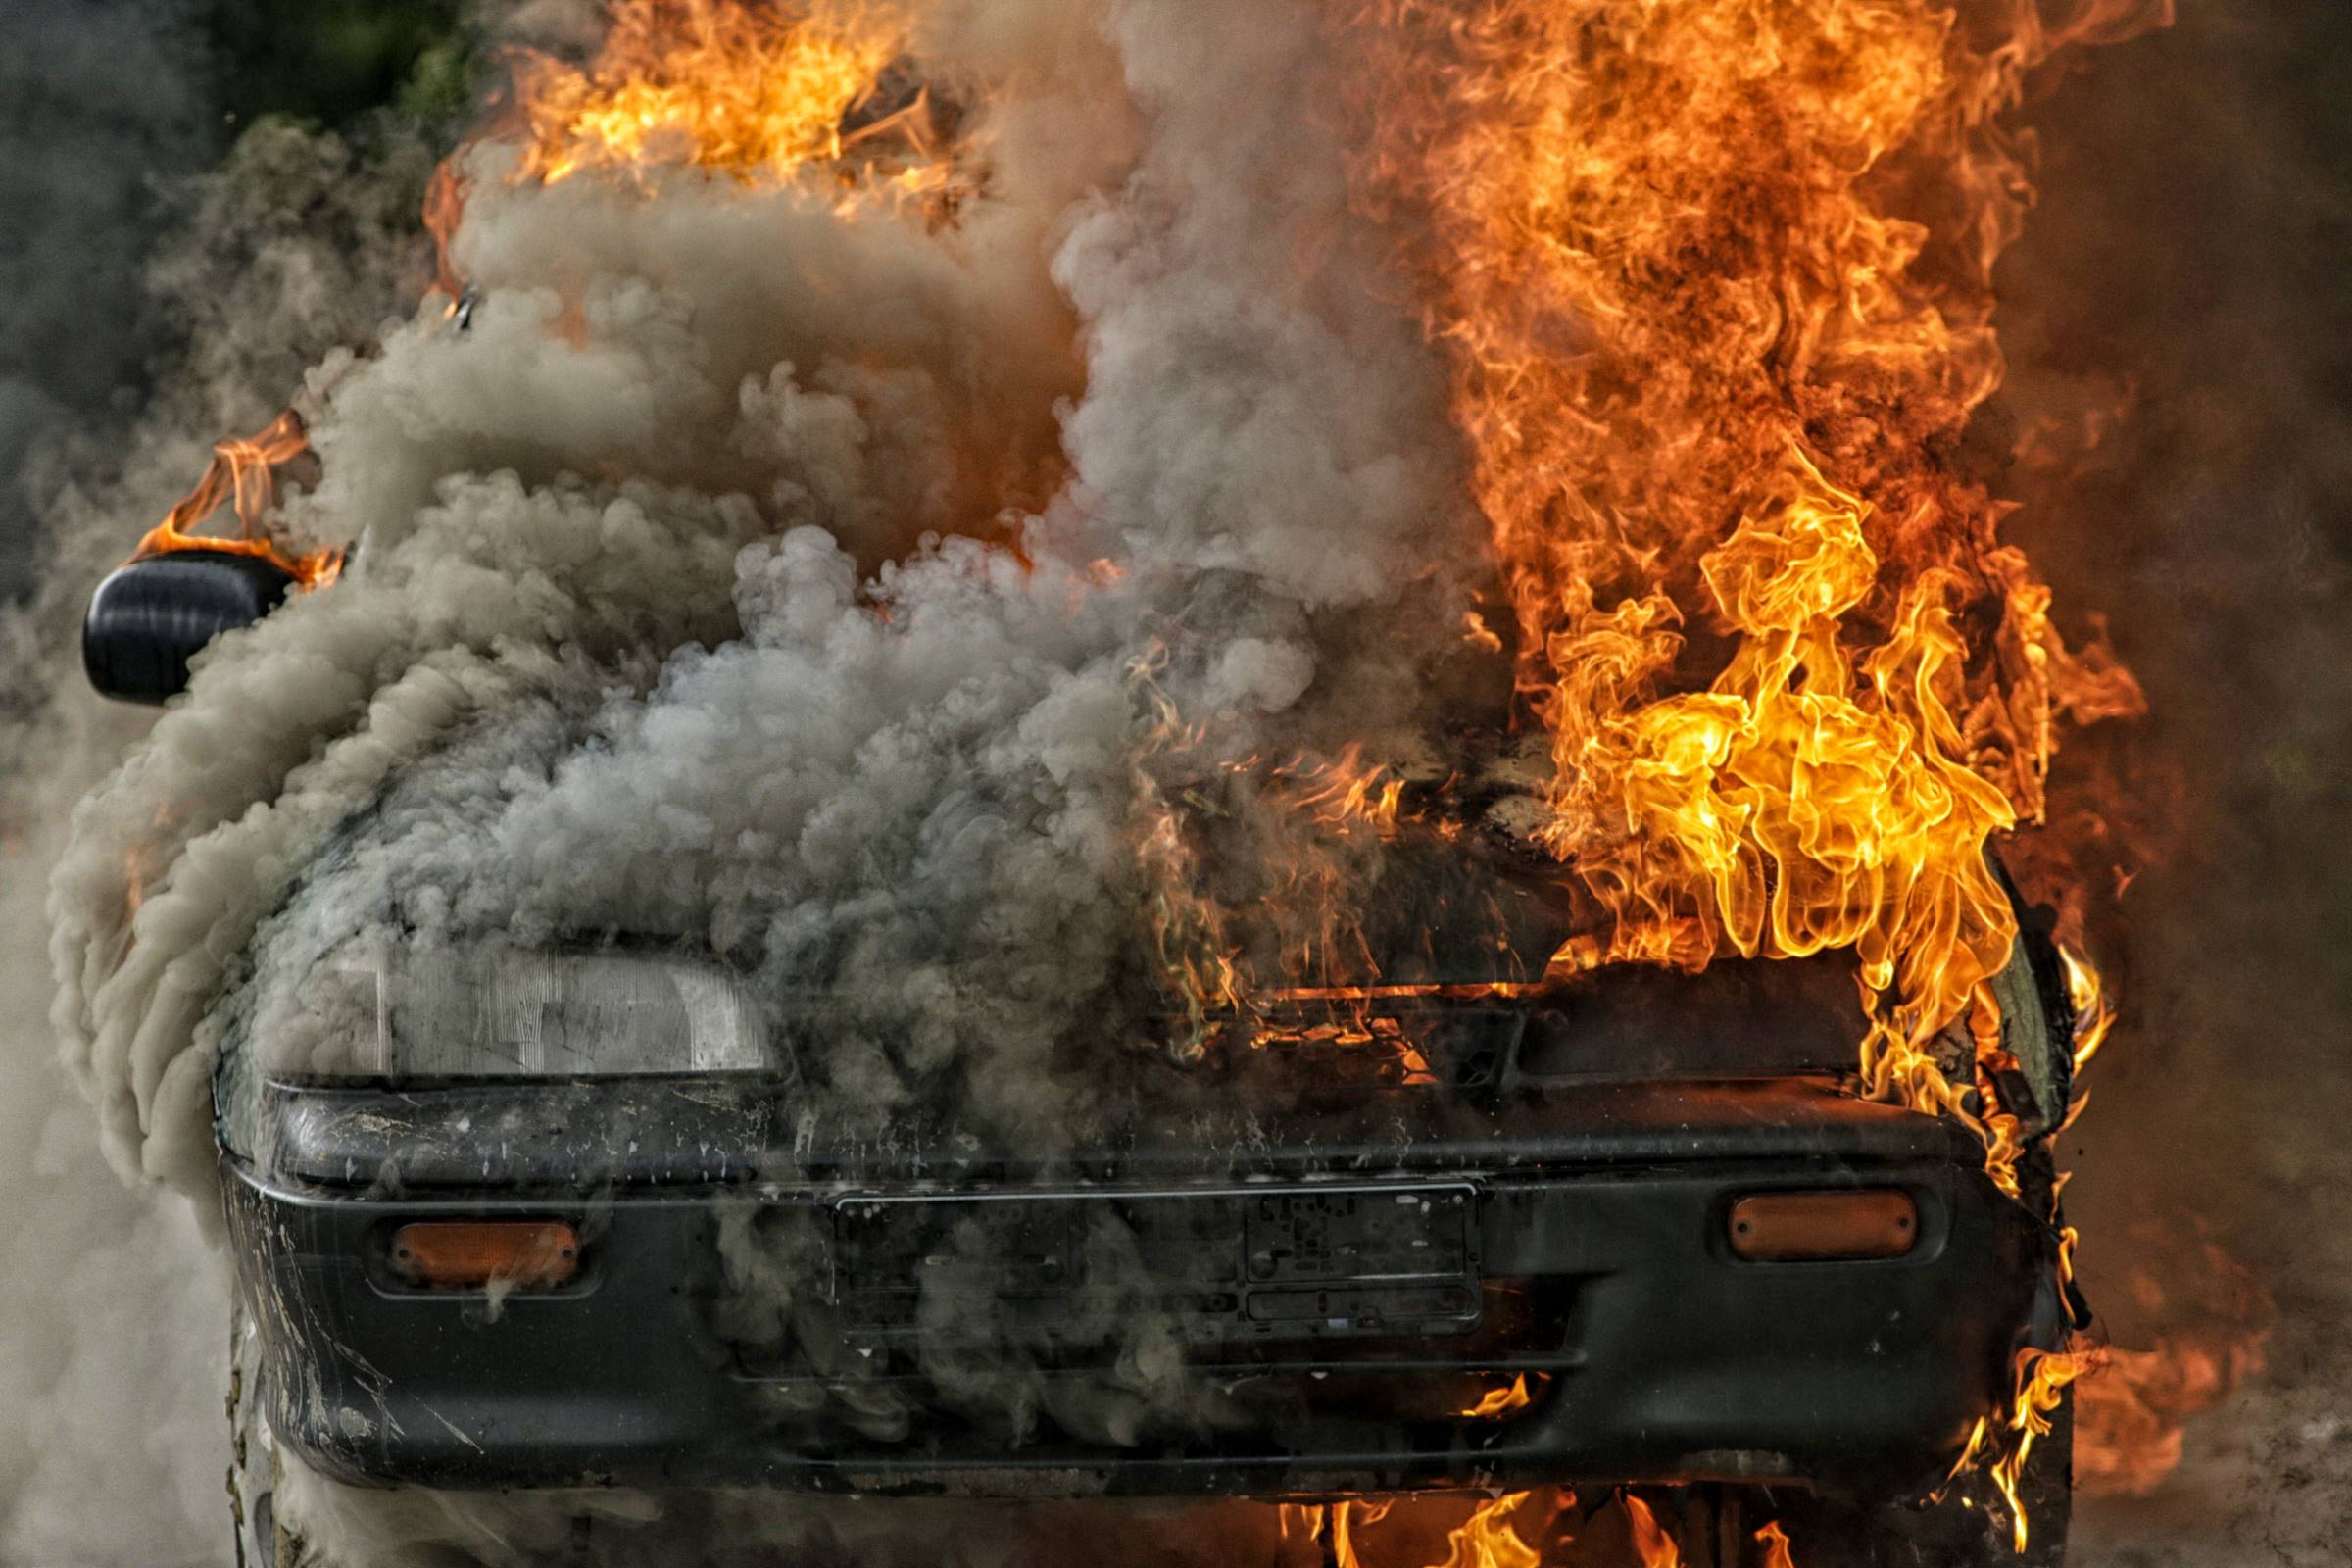 Burning,Car,-,Fire,And,Smoke